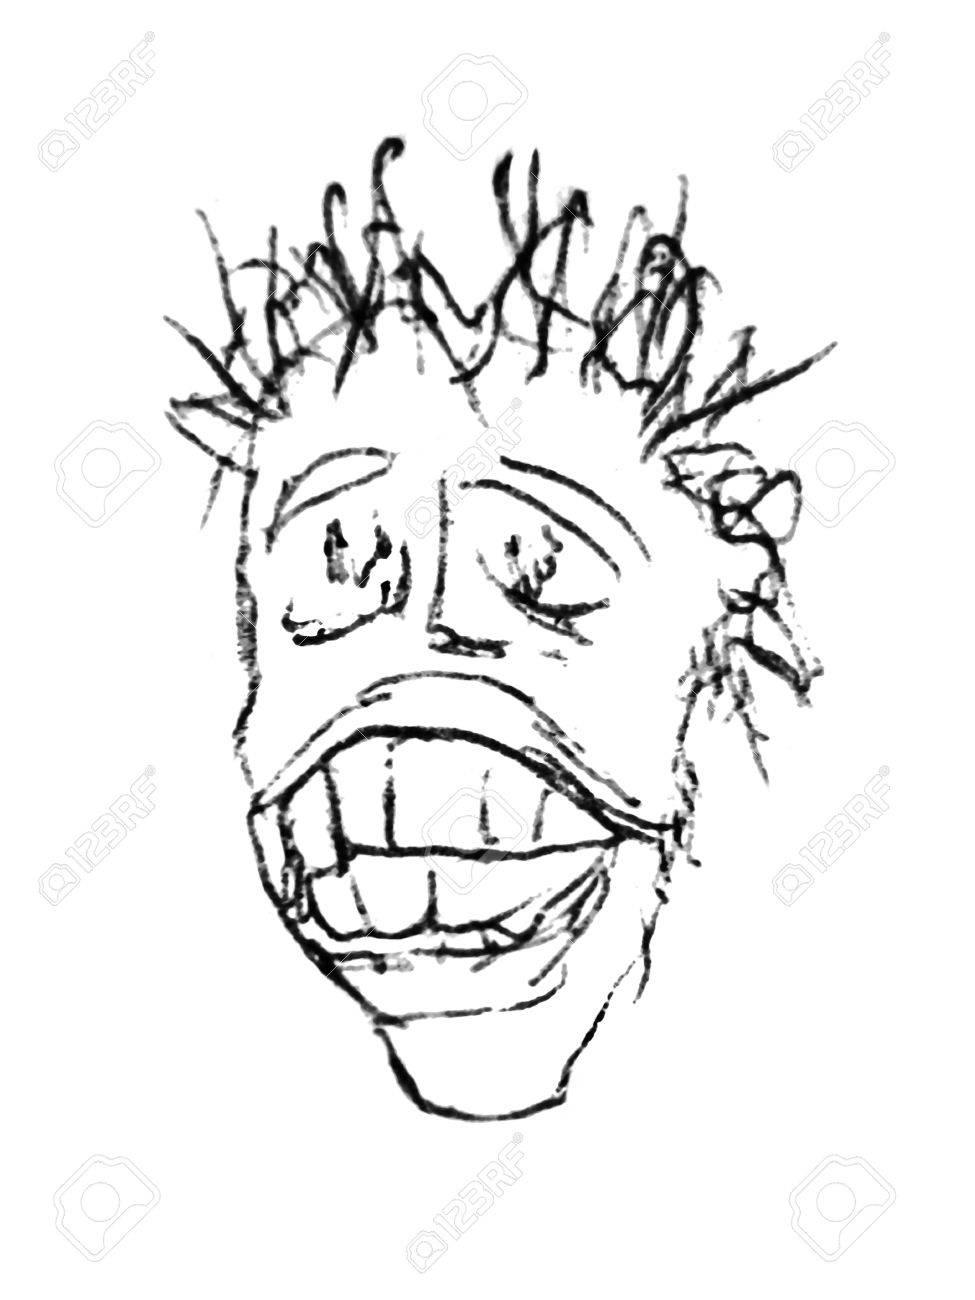 Pencil drawing sketch technique man portrait close up in black